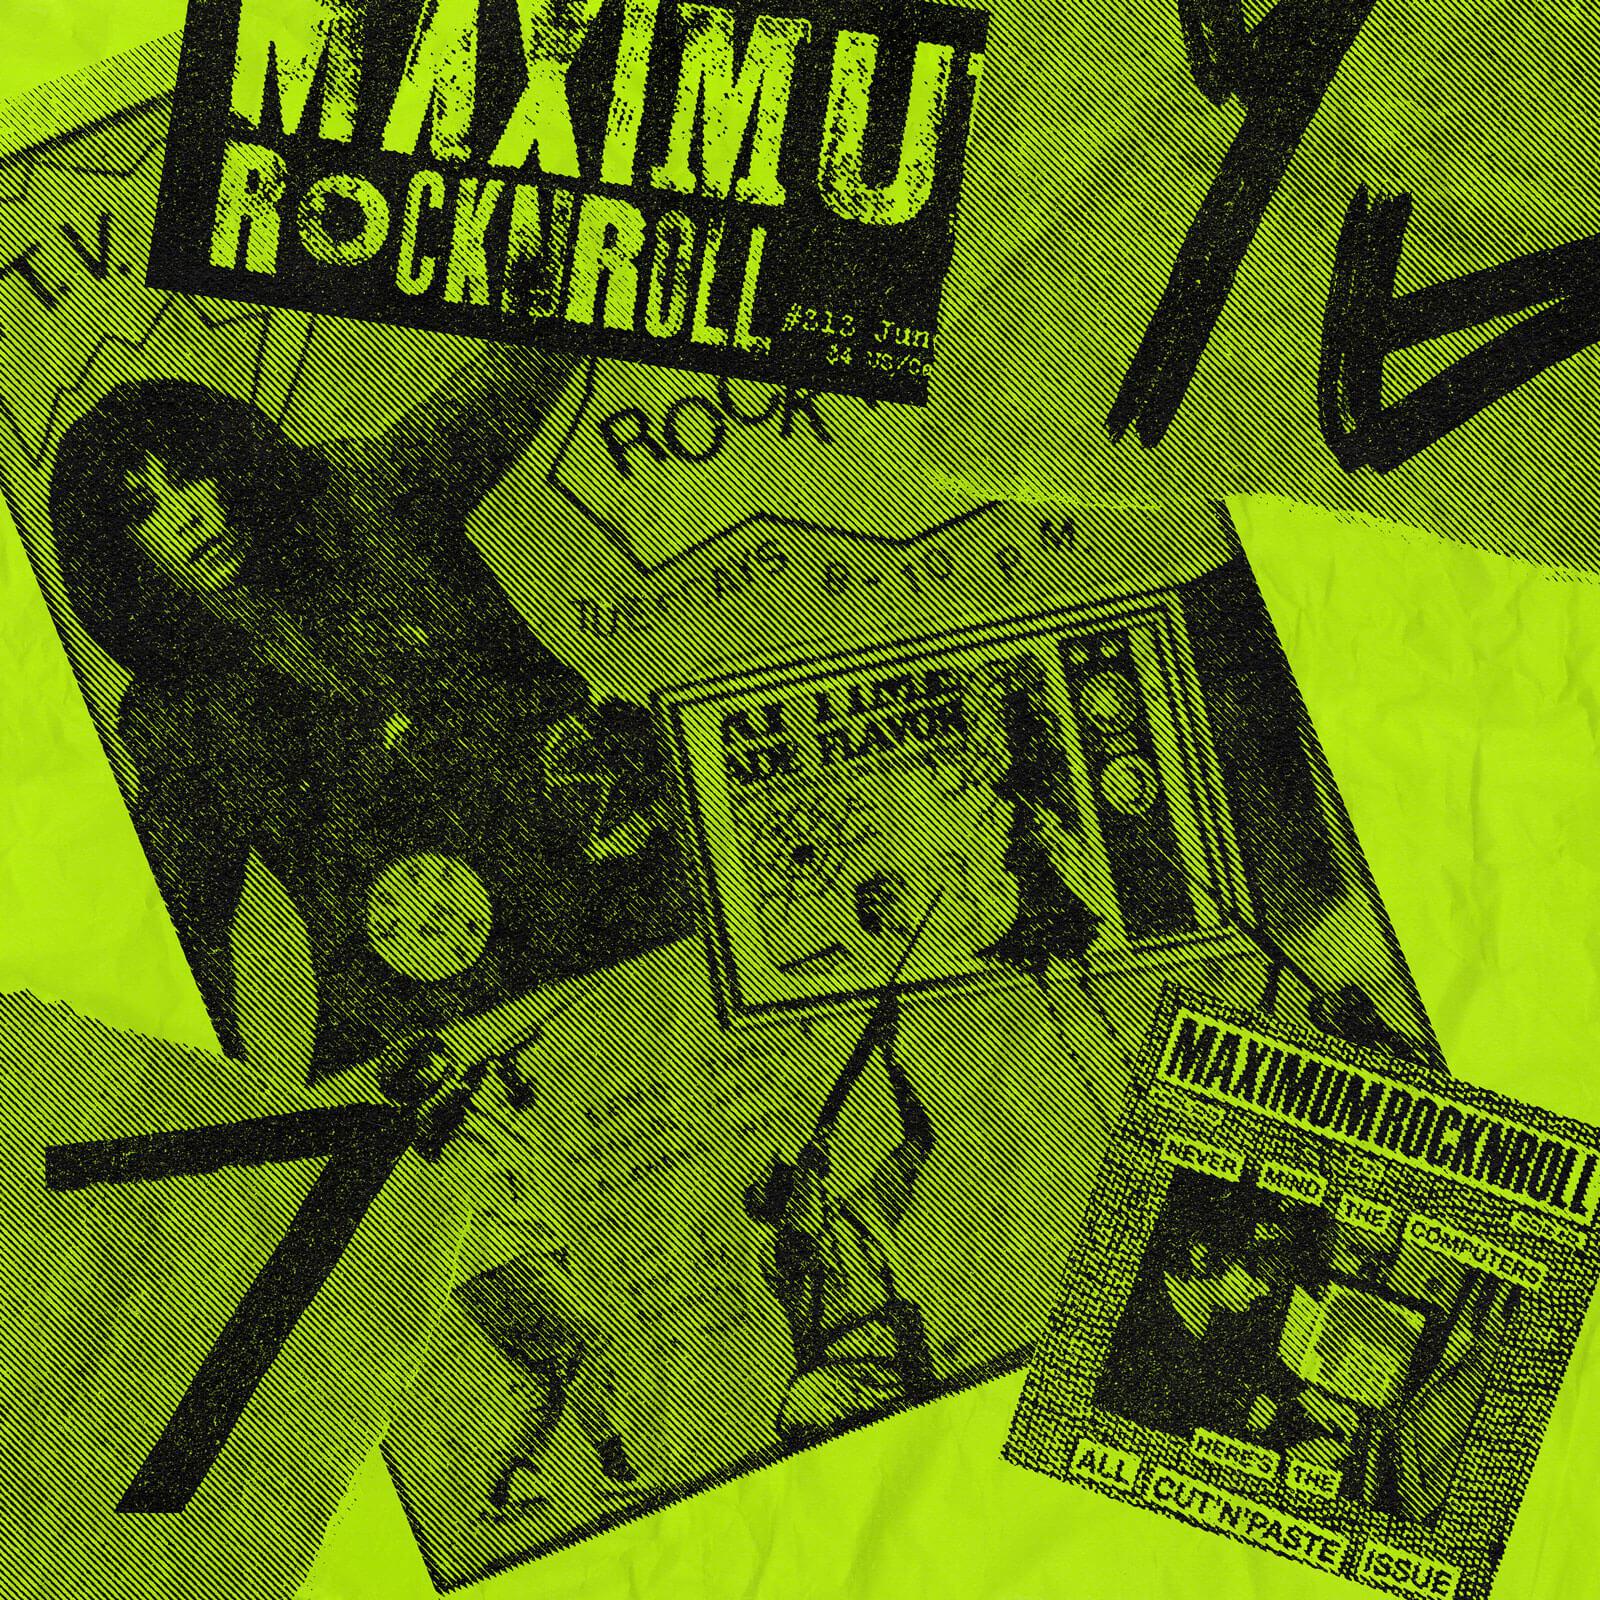 Maximum rock n roll collage.